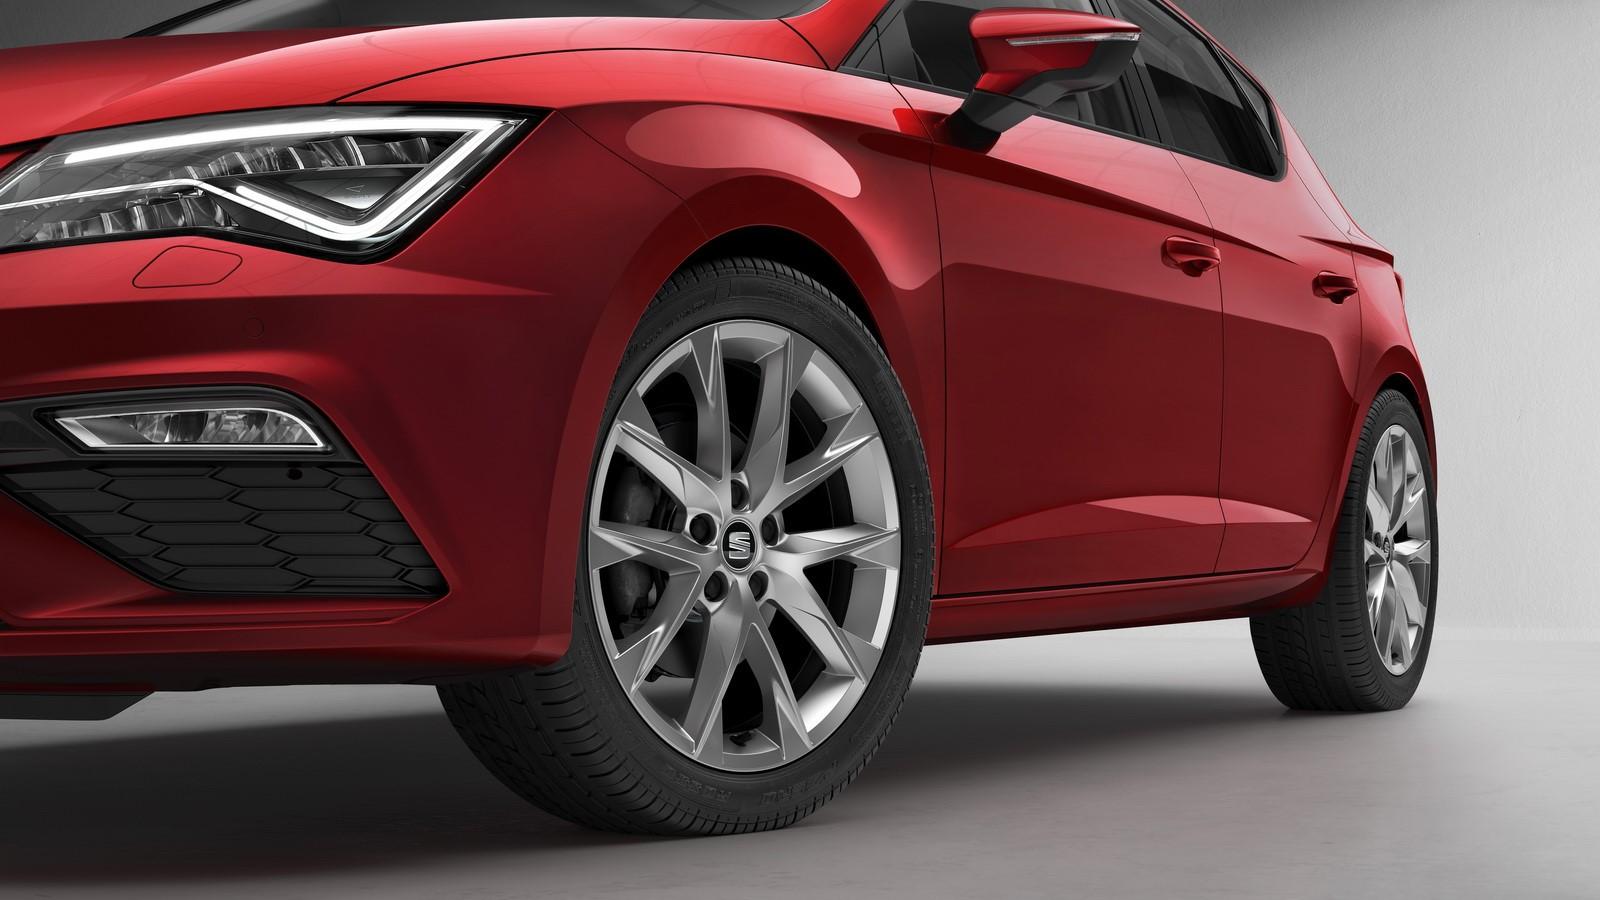 Seat Leon facelift 2017 (8)